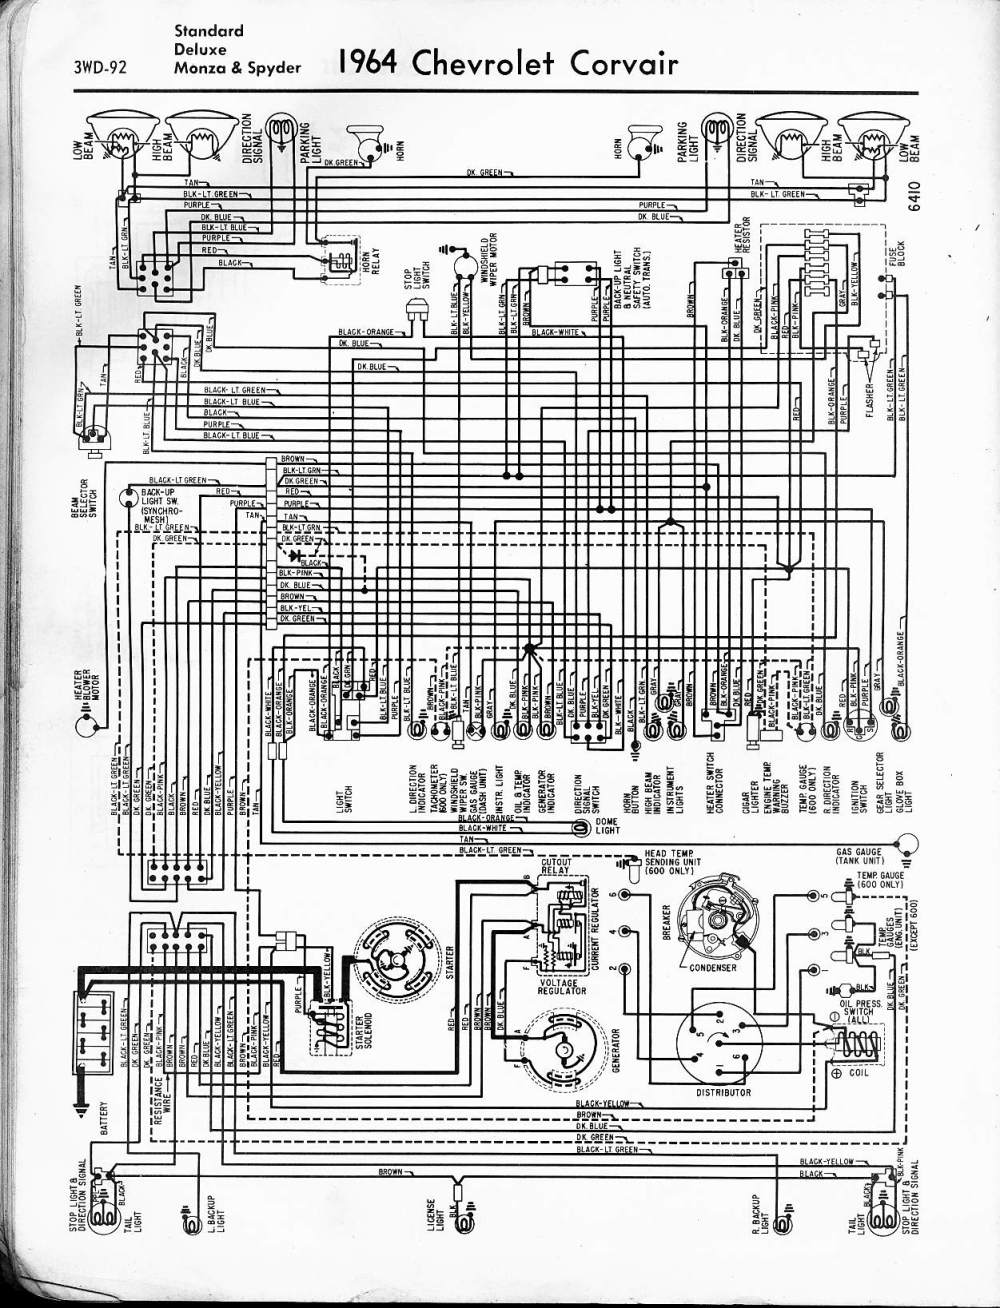 Corvair Wiring Diagram on 1964 c10 wiring diagram, 1964 volkswagen wiring diagram, 1961 corvair wiring diagram, 1964 cadillac wiring diagram, 1964 impala wiring diagram, 1964 mustang wiring diagram, 1966 corvair wiring diagram, 1963 corvair wiring diagram, 1964 falcon wiring diagram, 1964 corvair engine, 1964 corvette wiring diagram, corvair engine diagram, 1964 suburban wiring diagram, 1964 corvair firing order, 1964 chevelle wiring diagram, 1964 thunderbird wiring diagram, 1964 gmc wiring diagram, 1964 malibu wiring diagram, 1965 corvair wiring diagram, 1964 nova wiring diagram,